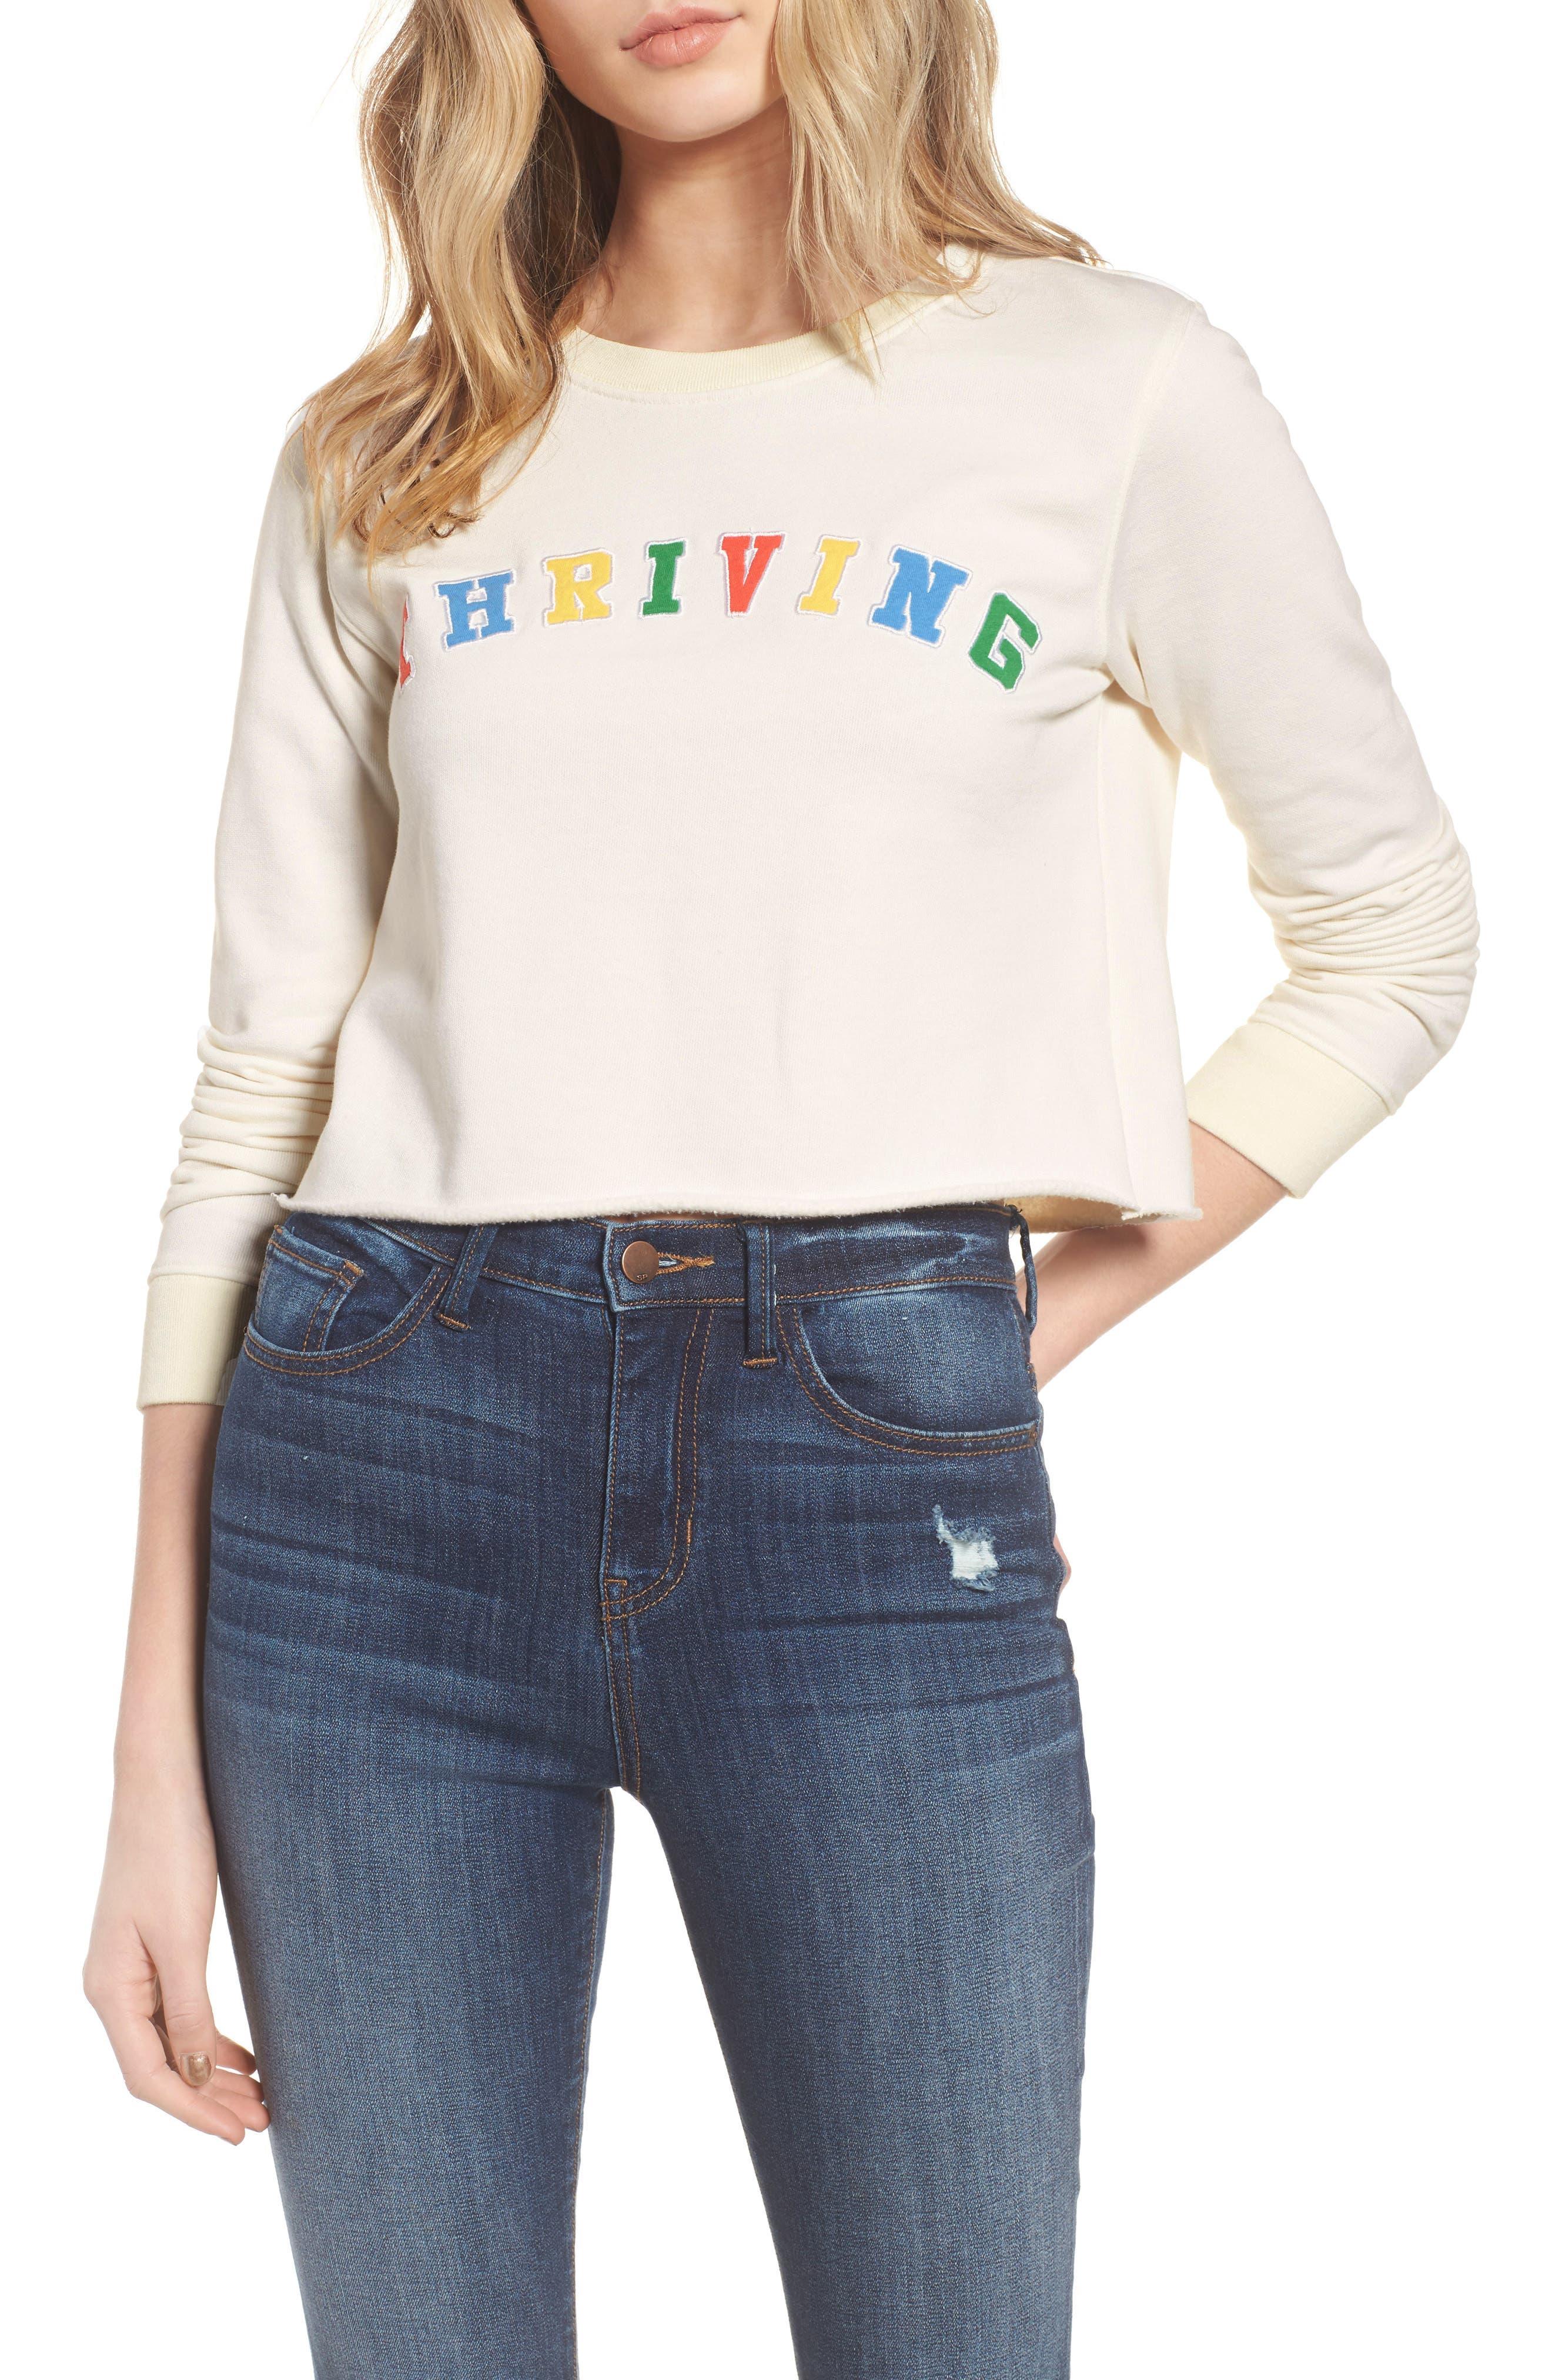 Desert Dreamer Thriving Crop Sweatshirt